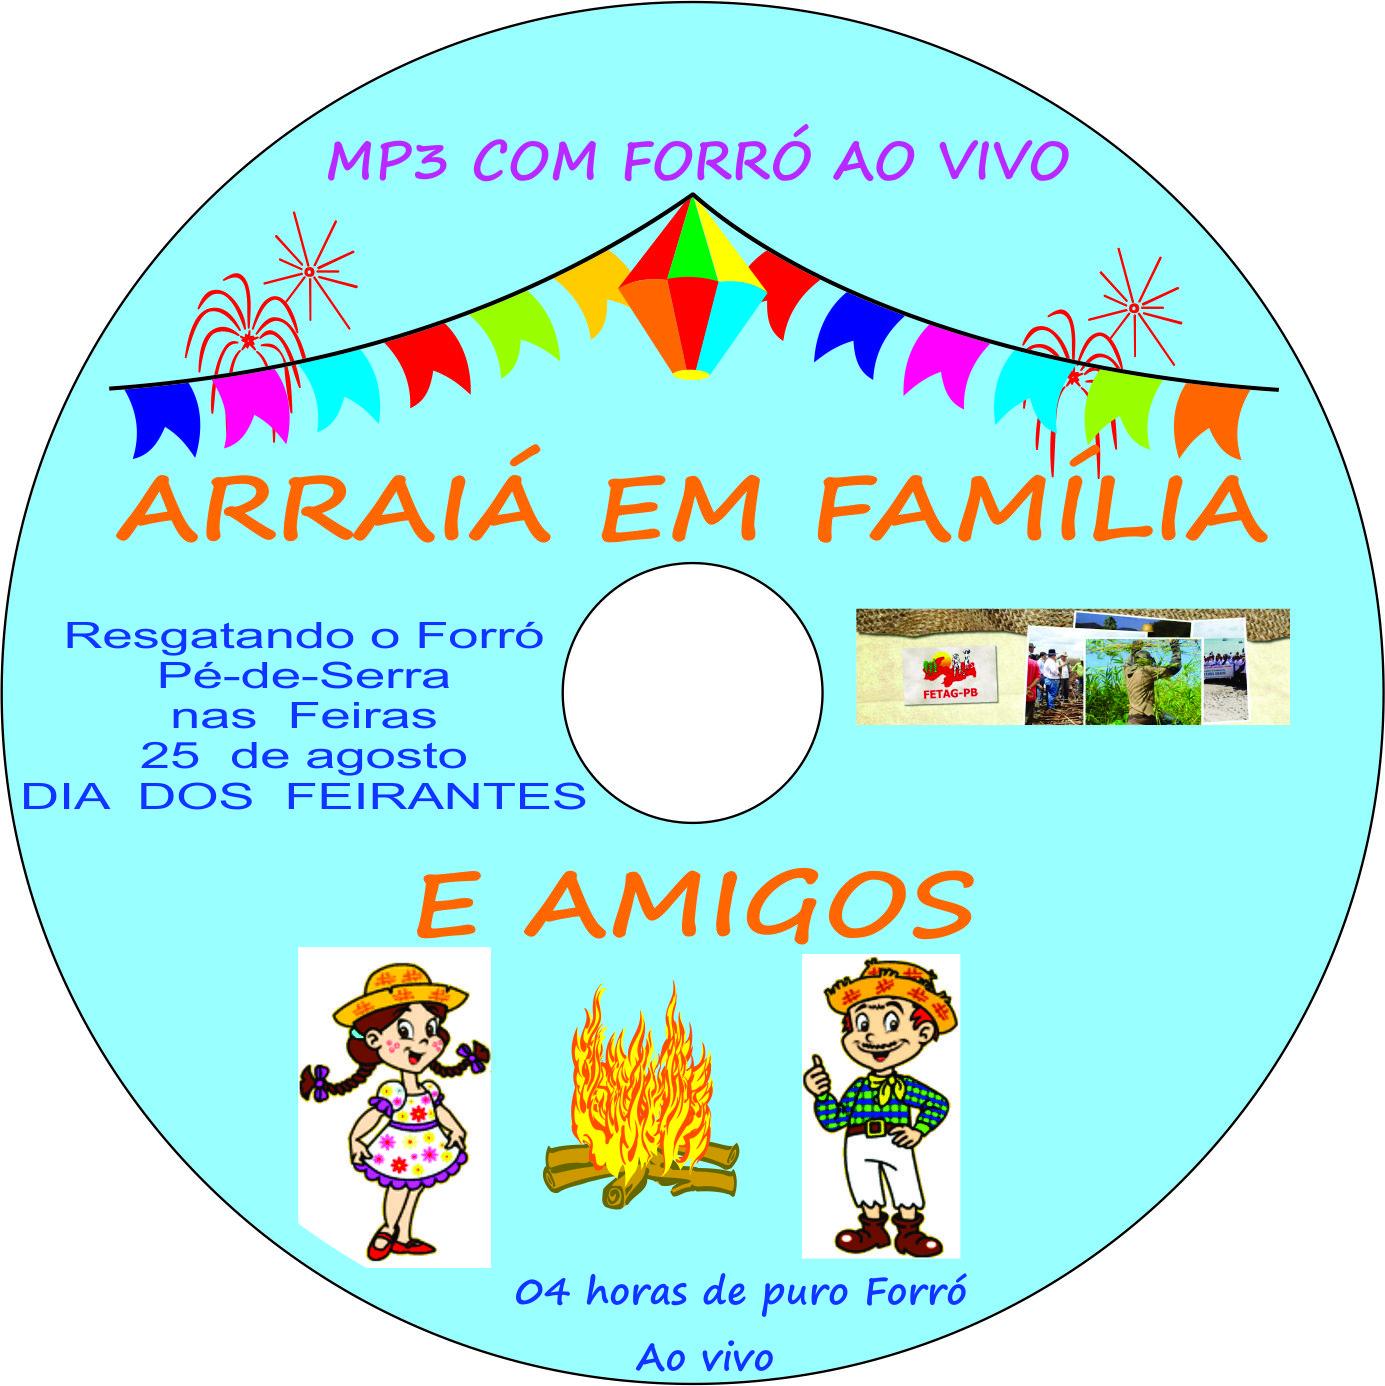 M P  3  FORRO AO VIVO  PARA OS  FEIRANTES  DA PARAIBA